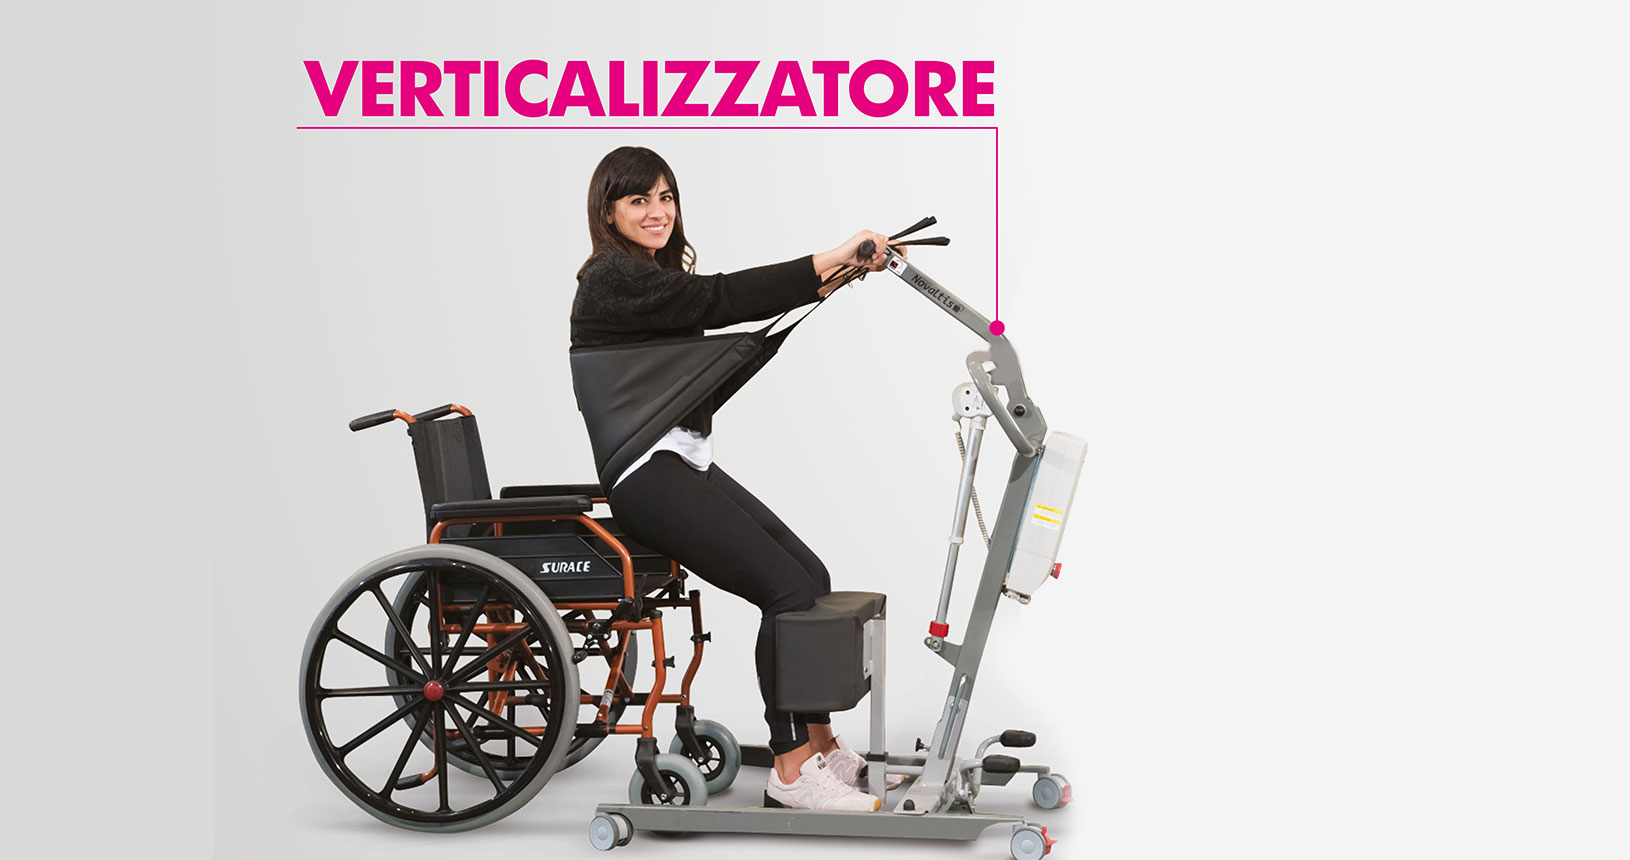 img-noleggio-verticalizzatore_new